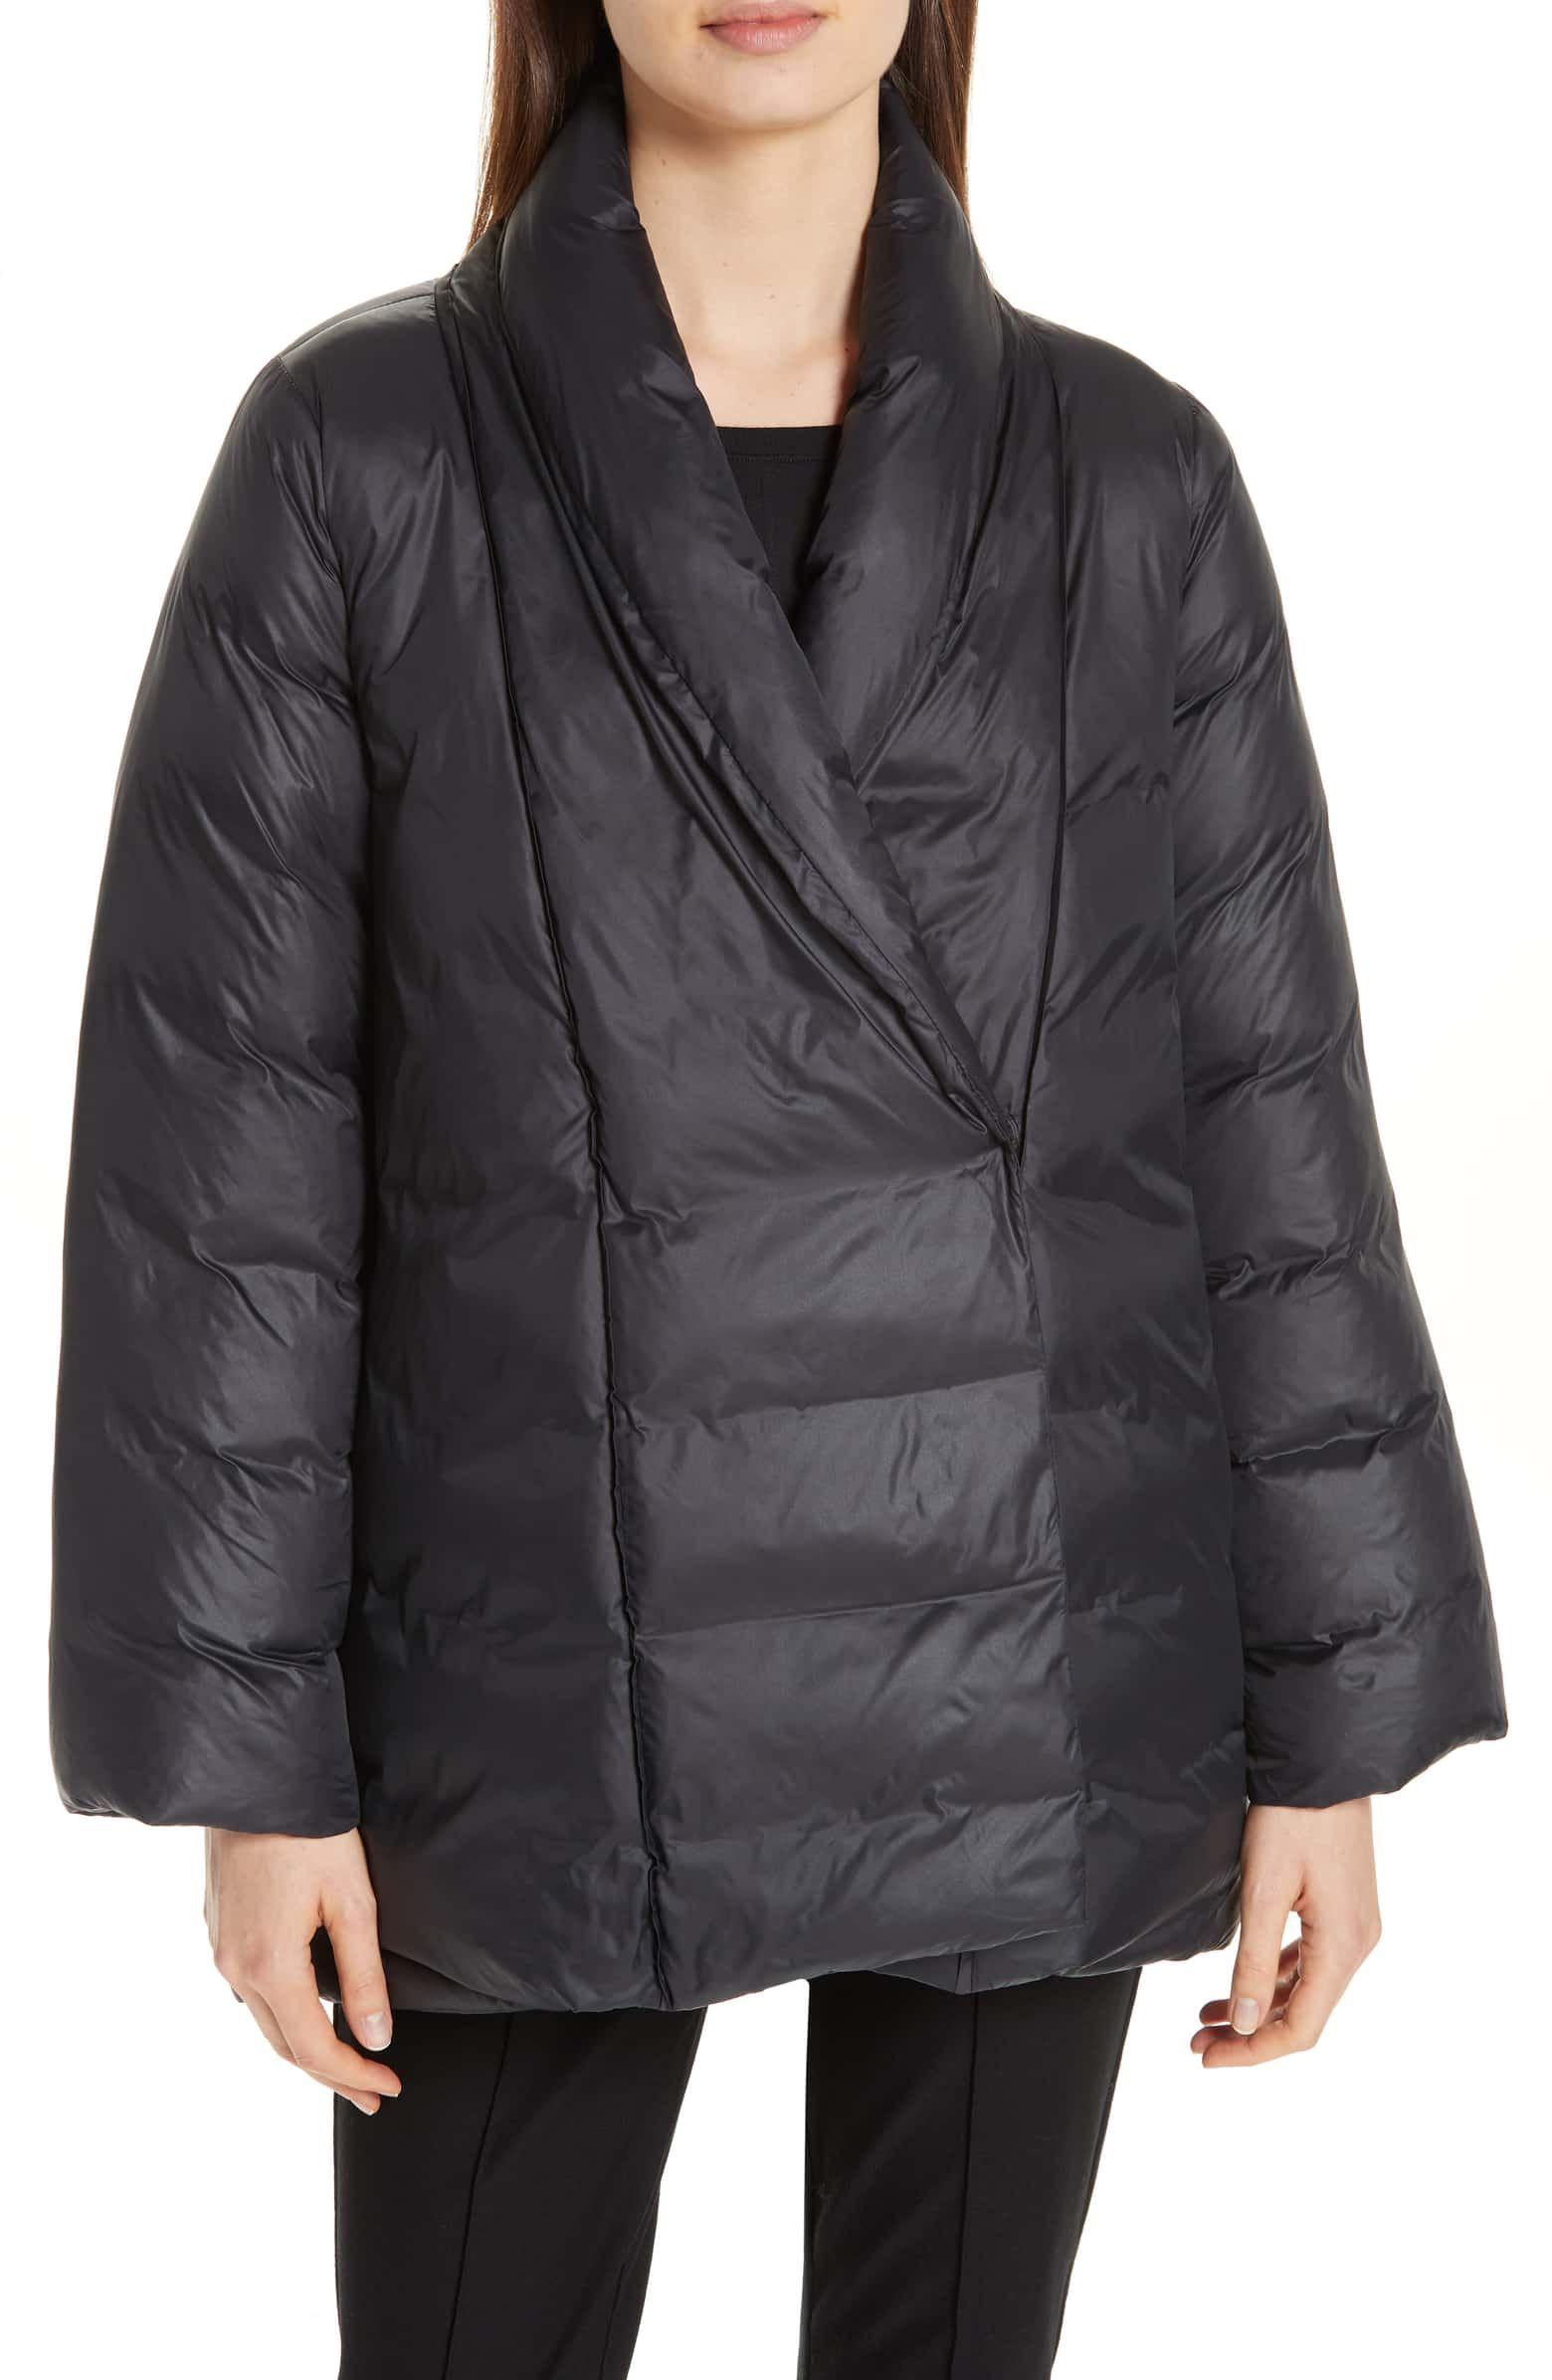 Eileen Fisher High Shawl Collar Down Coat Nordstrom Down Coat Coats Jackets Women Coats For Women [ 2392 x 1560 Pixel ]